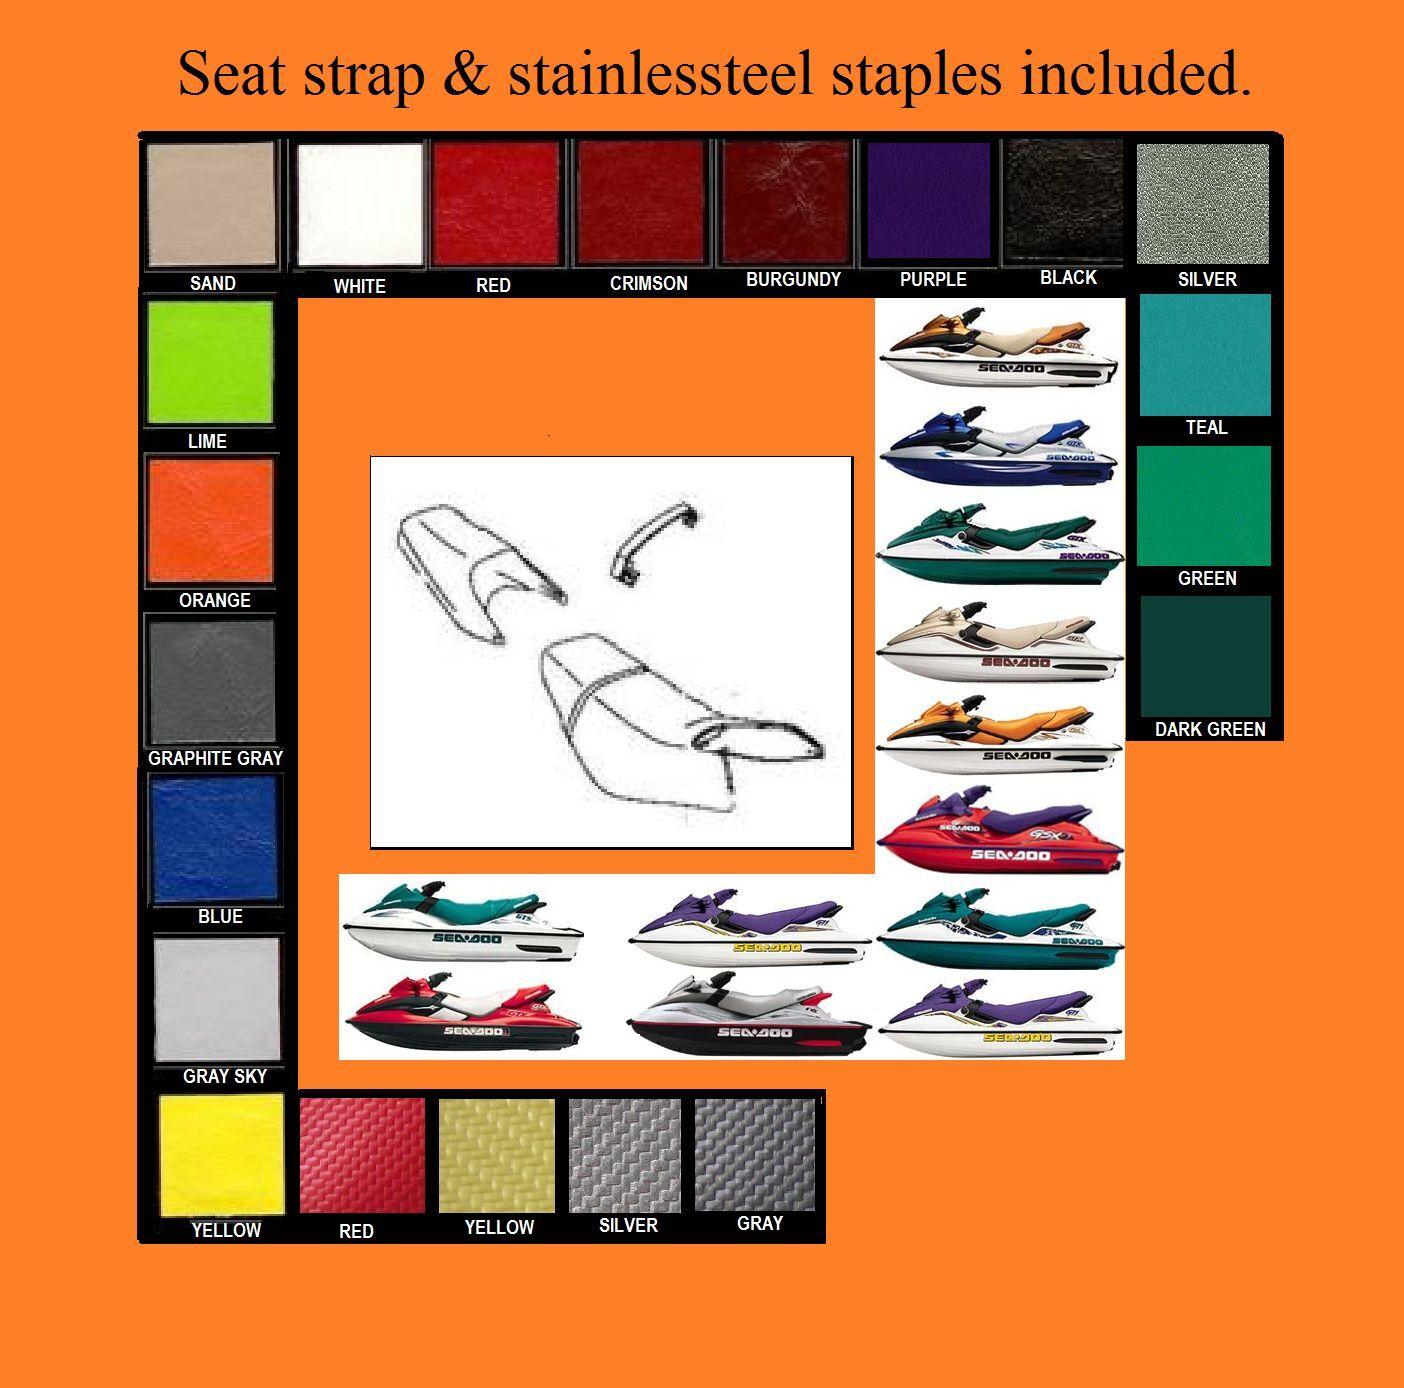 Jet Ski GTS-GTI-GTX Sea Doo Seat Cover 02-067 Purple *new* :